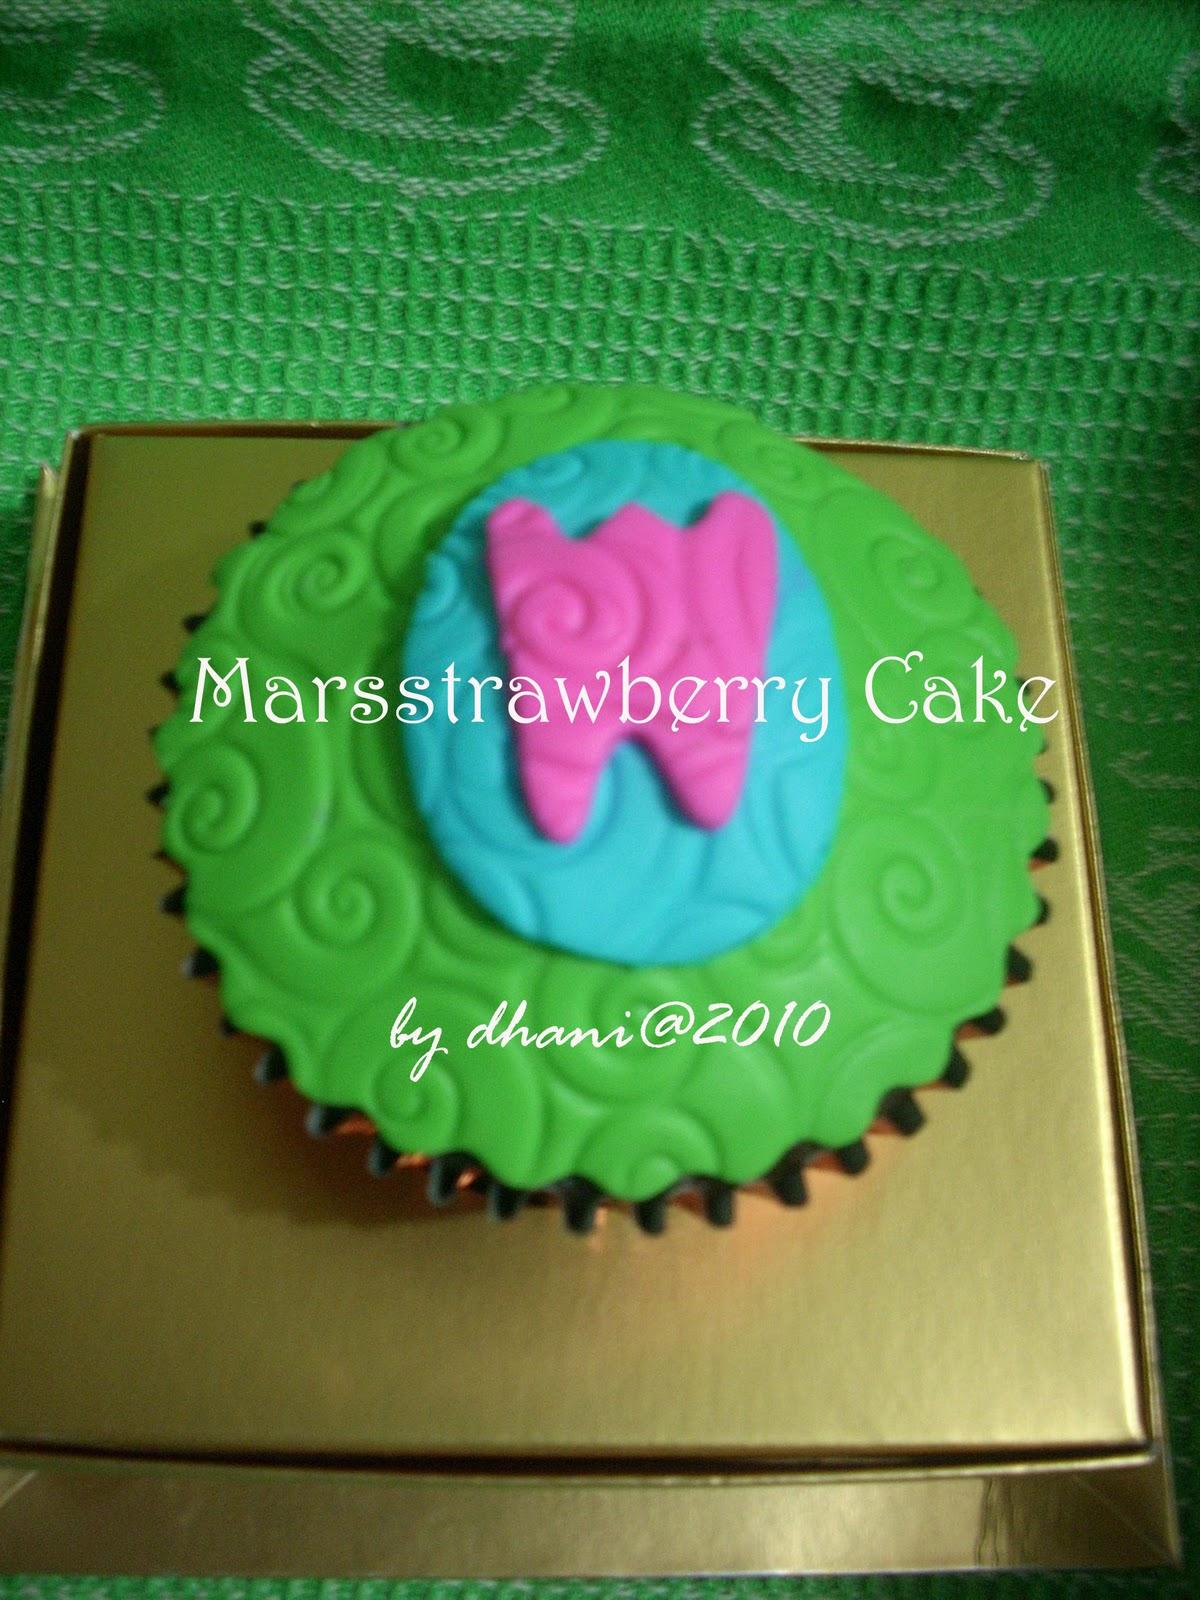 Mars Cake D H Marsstrawberry 2010 Brownies Kopi Aceh Varian By Tira Nad Cupcake Wiku Dan Ratri